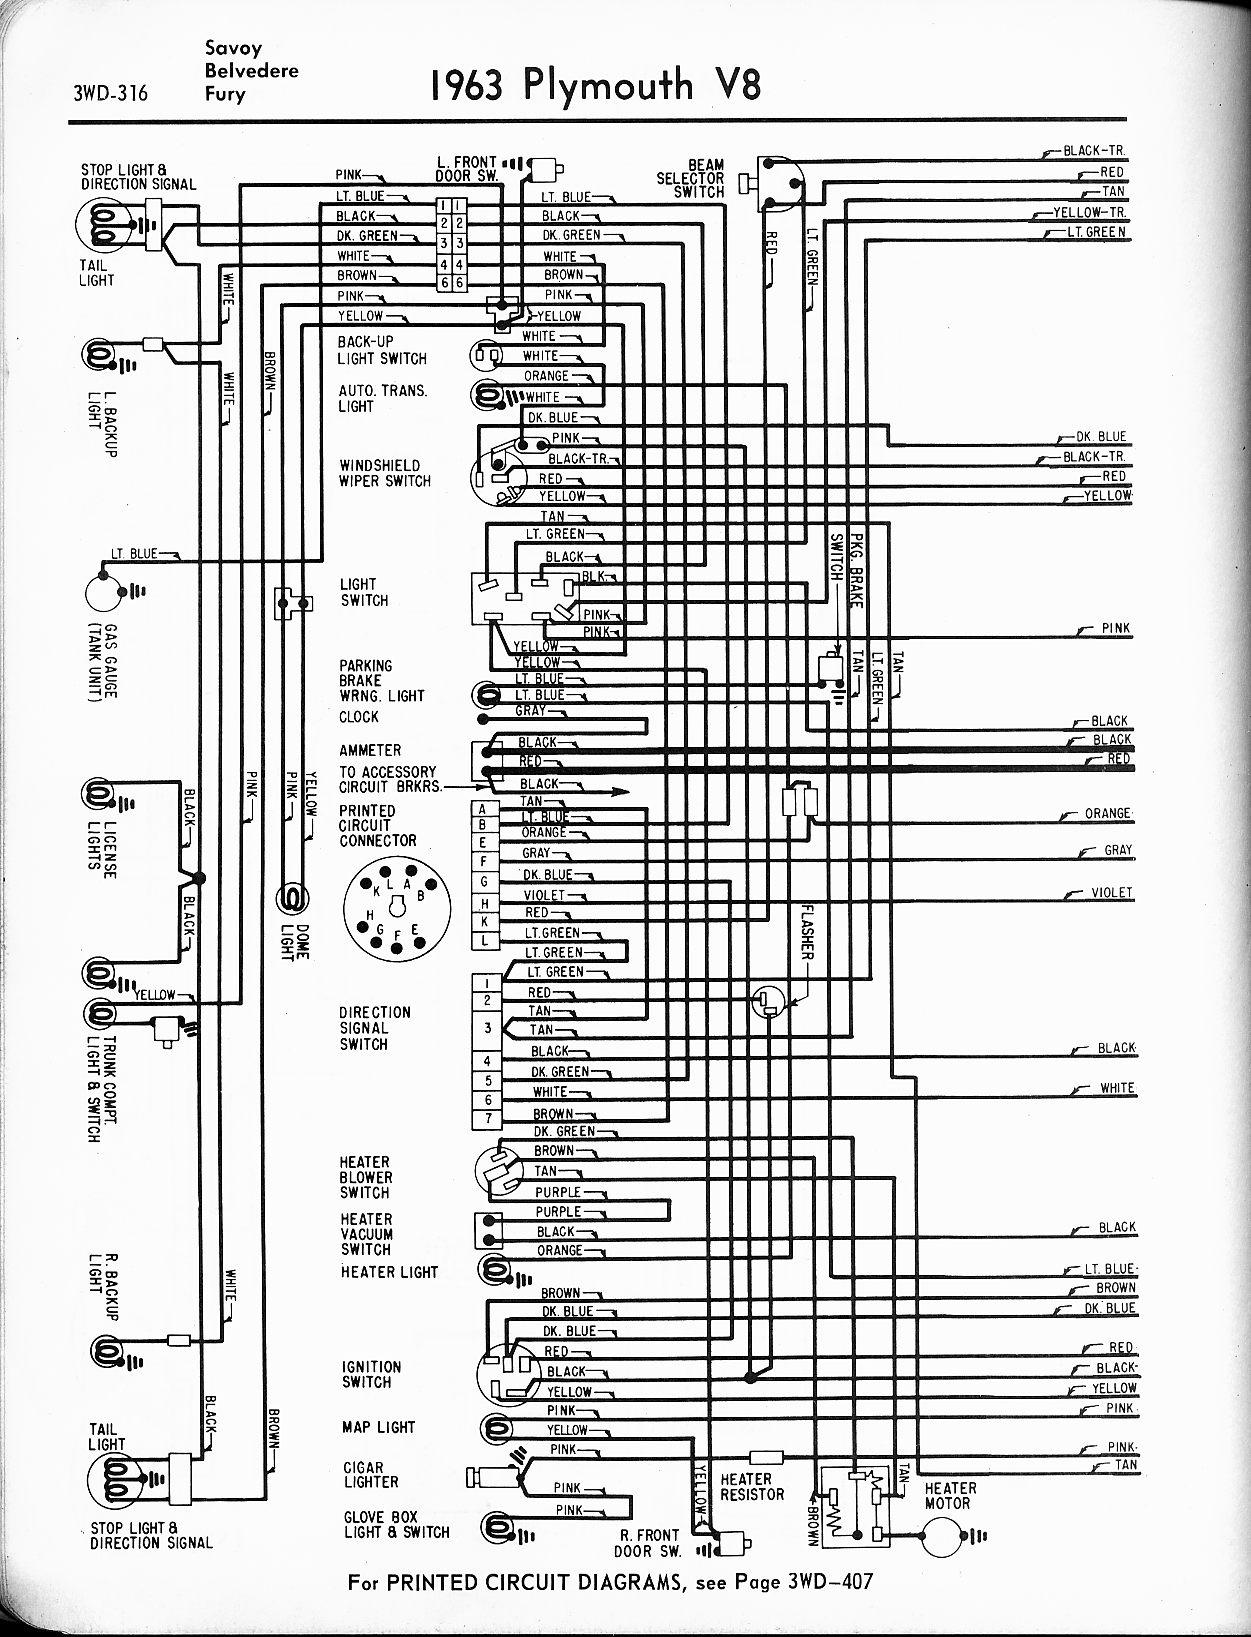 Vz Wiring Diagram